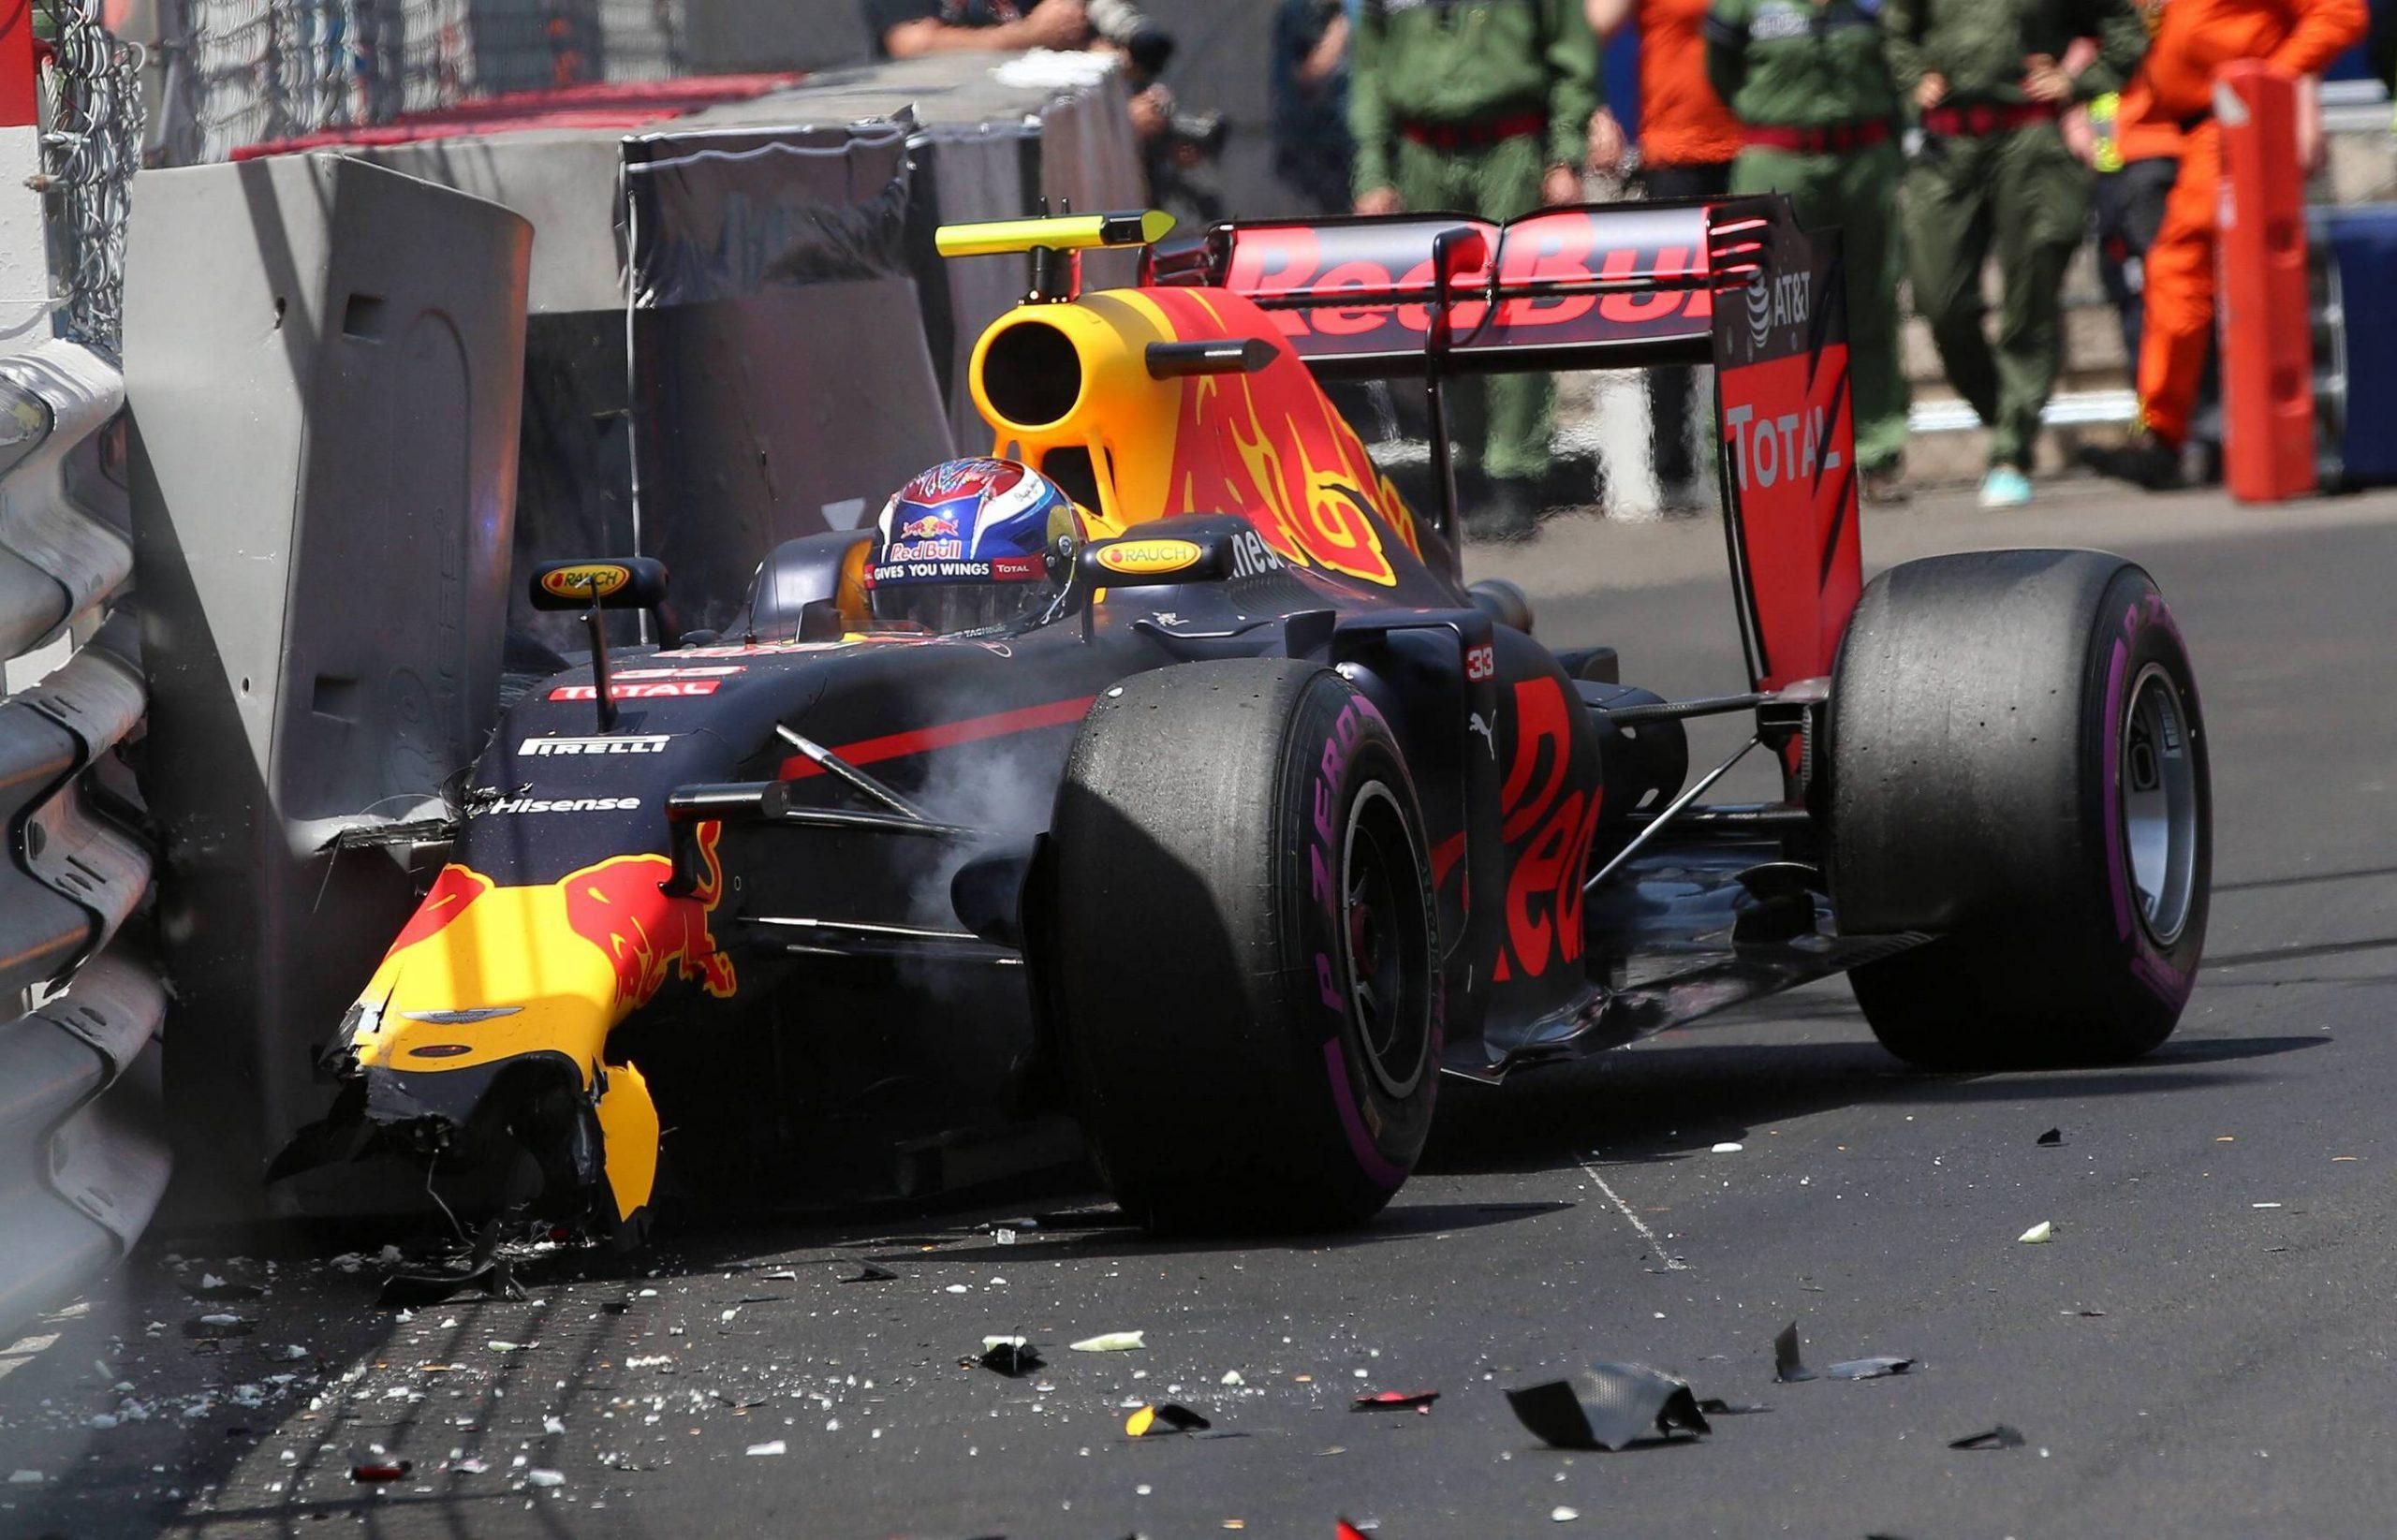 Crash Max Verstappen Red Bull Racing formula 1 GP Monaco 28 05 2016 Photo mspb Jerry Andre Crash